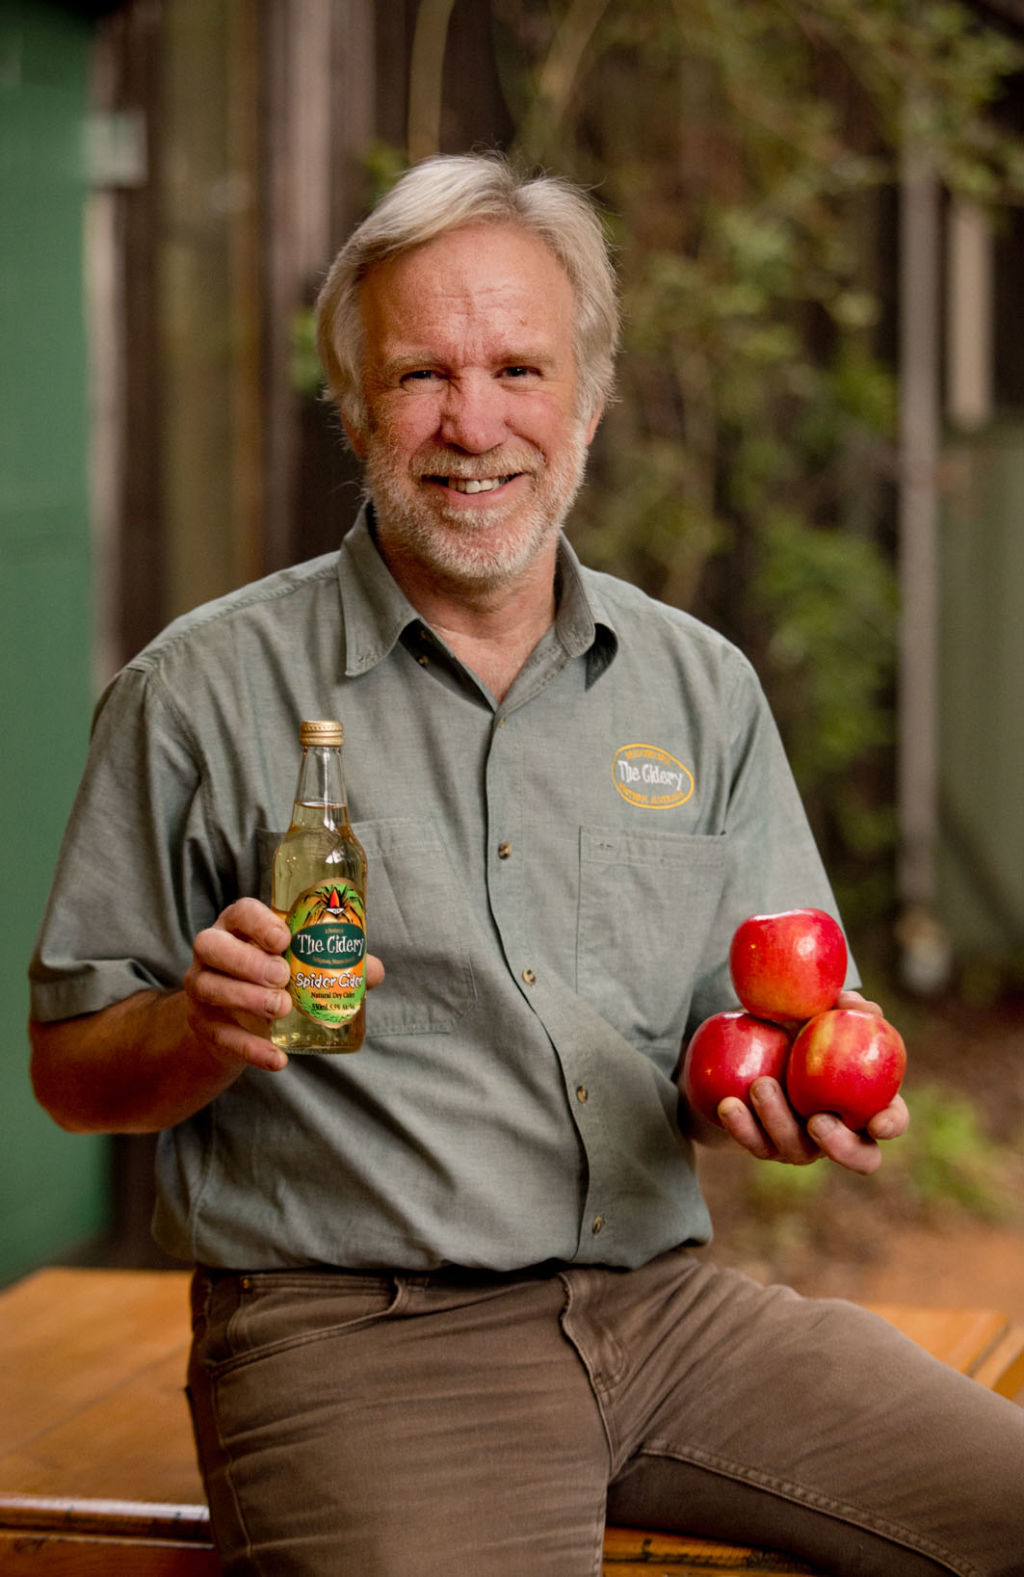 John_Lucey_co-owner_of_The_Cidery_etlbtq